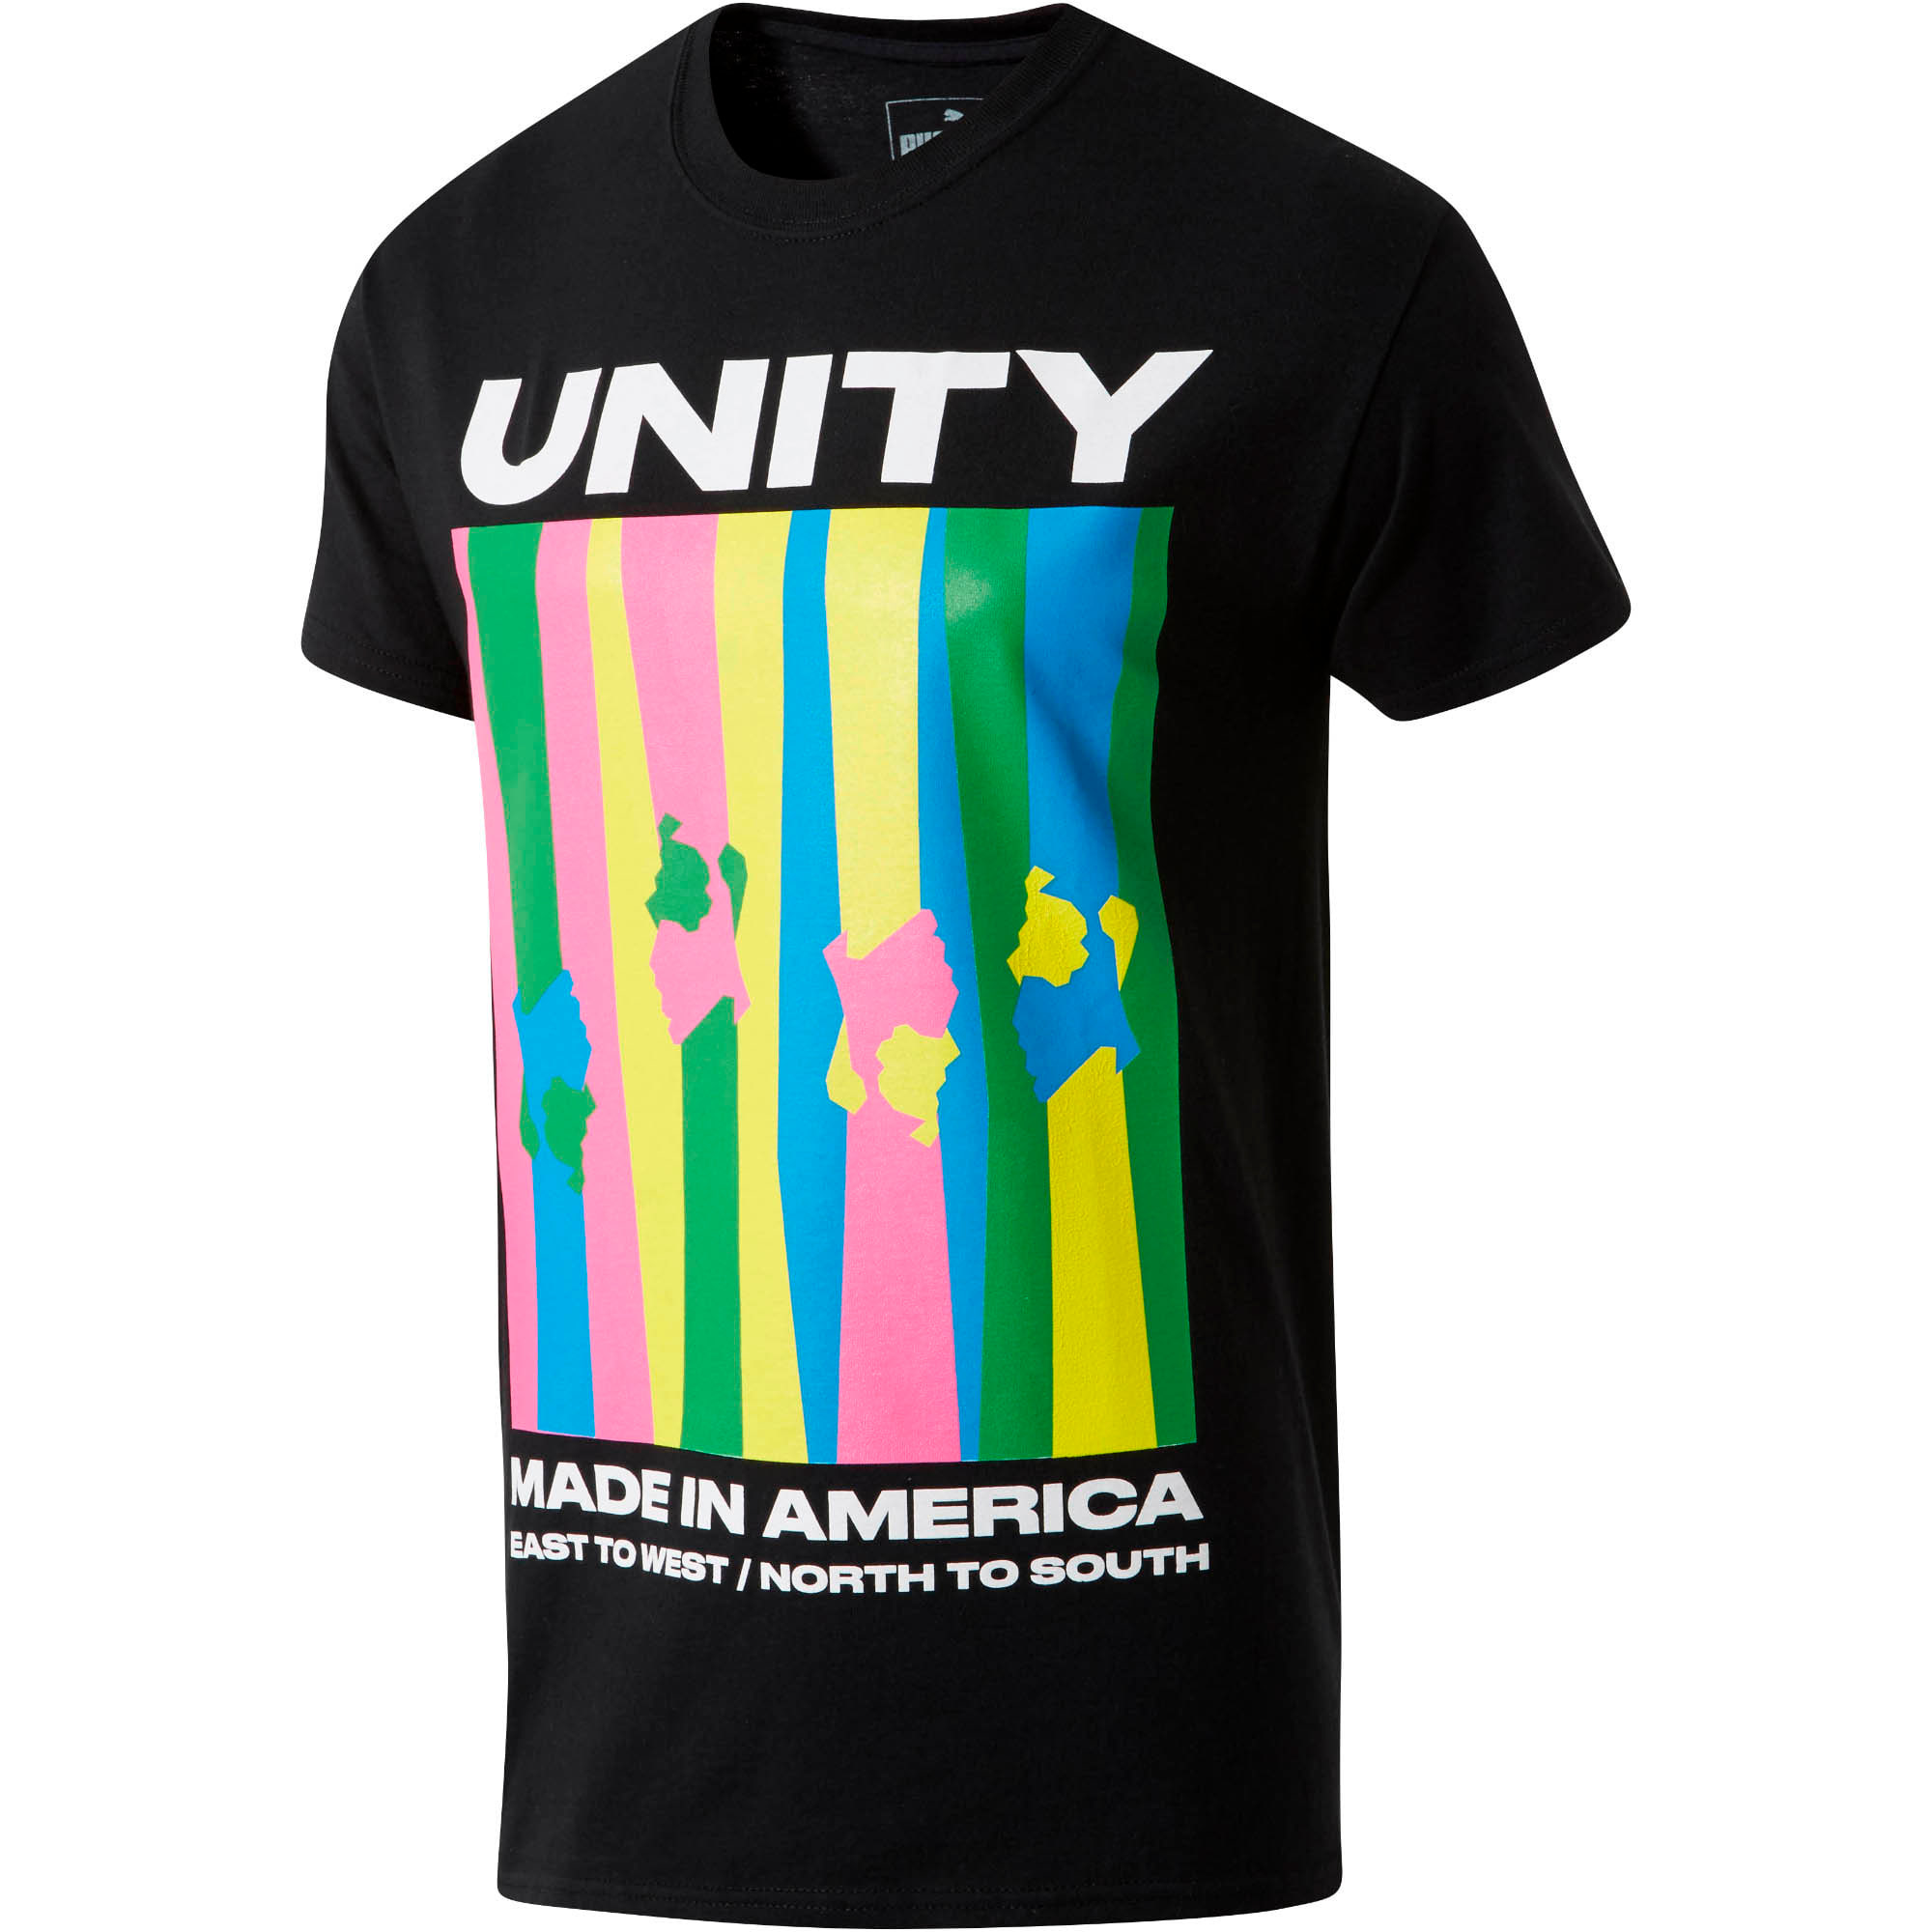 Thumbnail 1 of PUMA Unity x MIA x Josh Vides Classic Short Sleeve T-Shirt, Black, medium